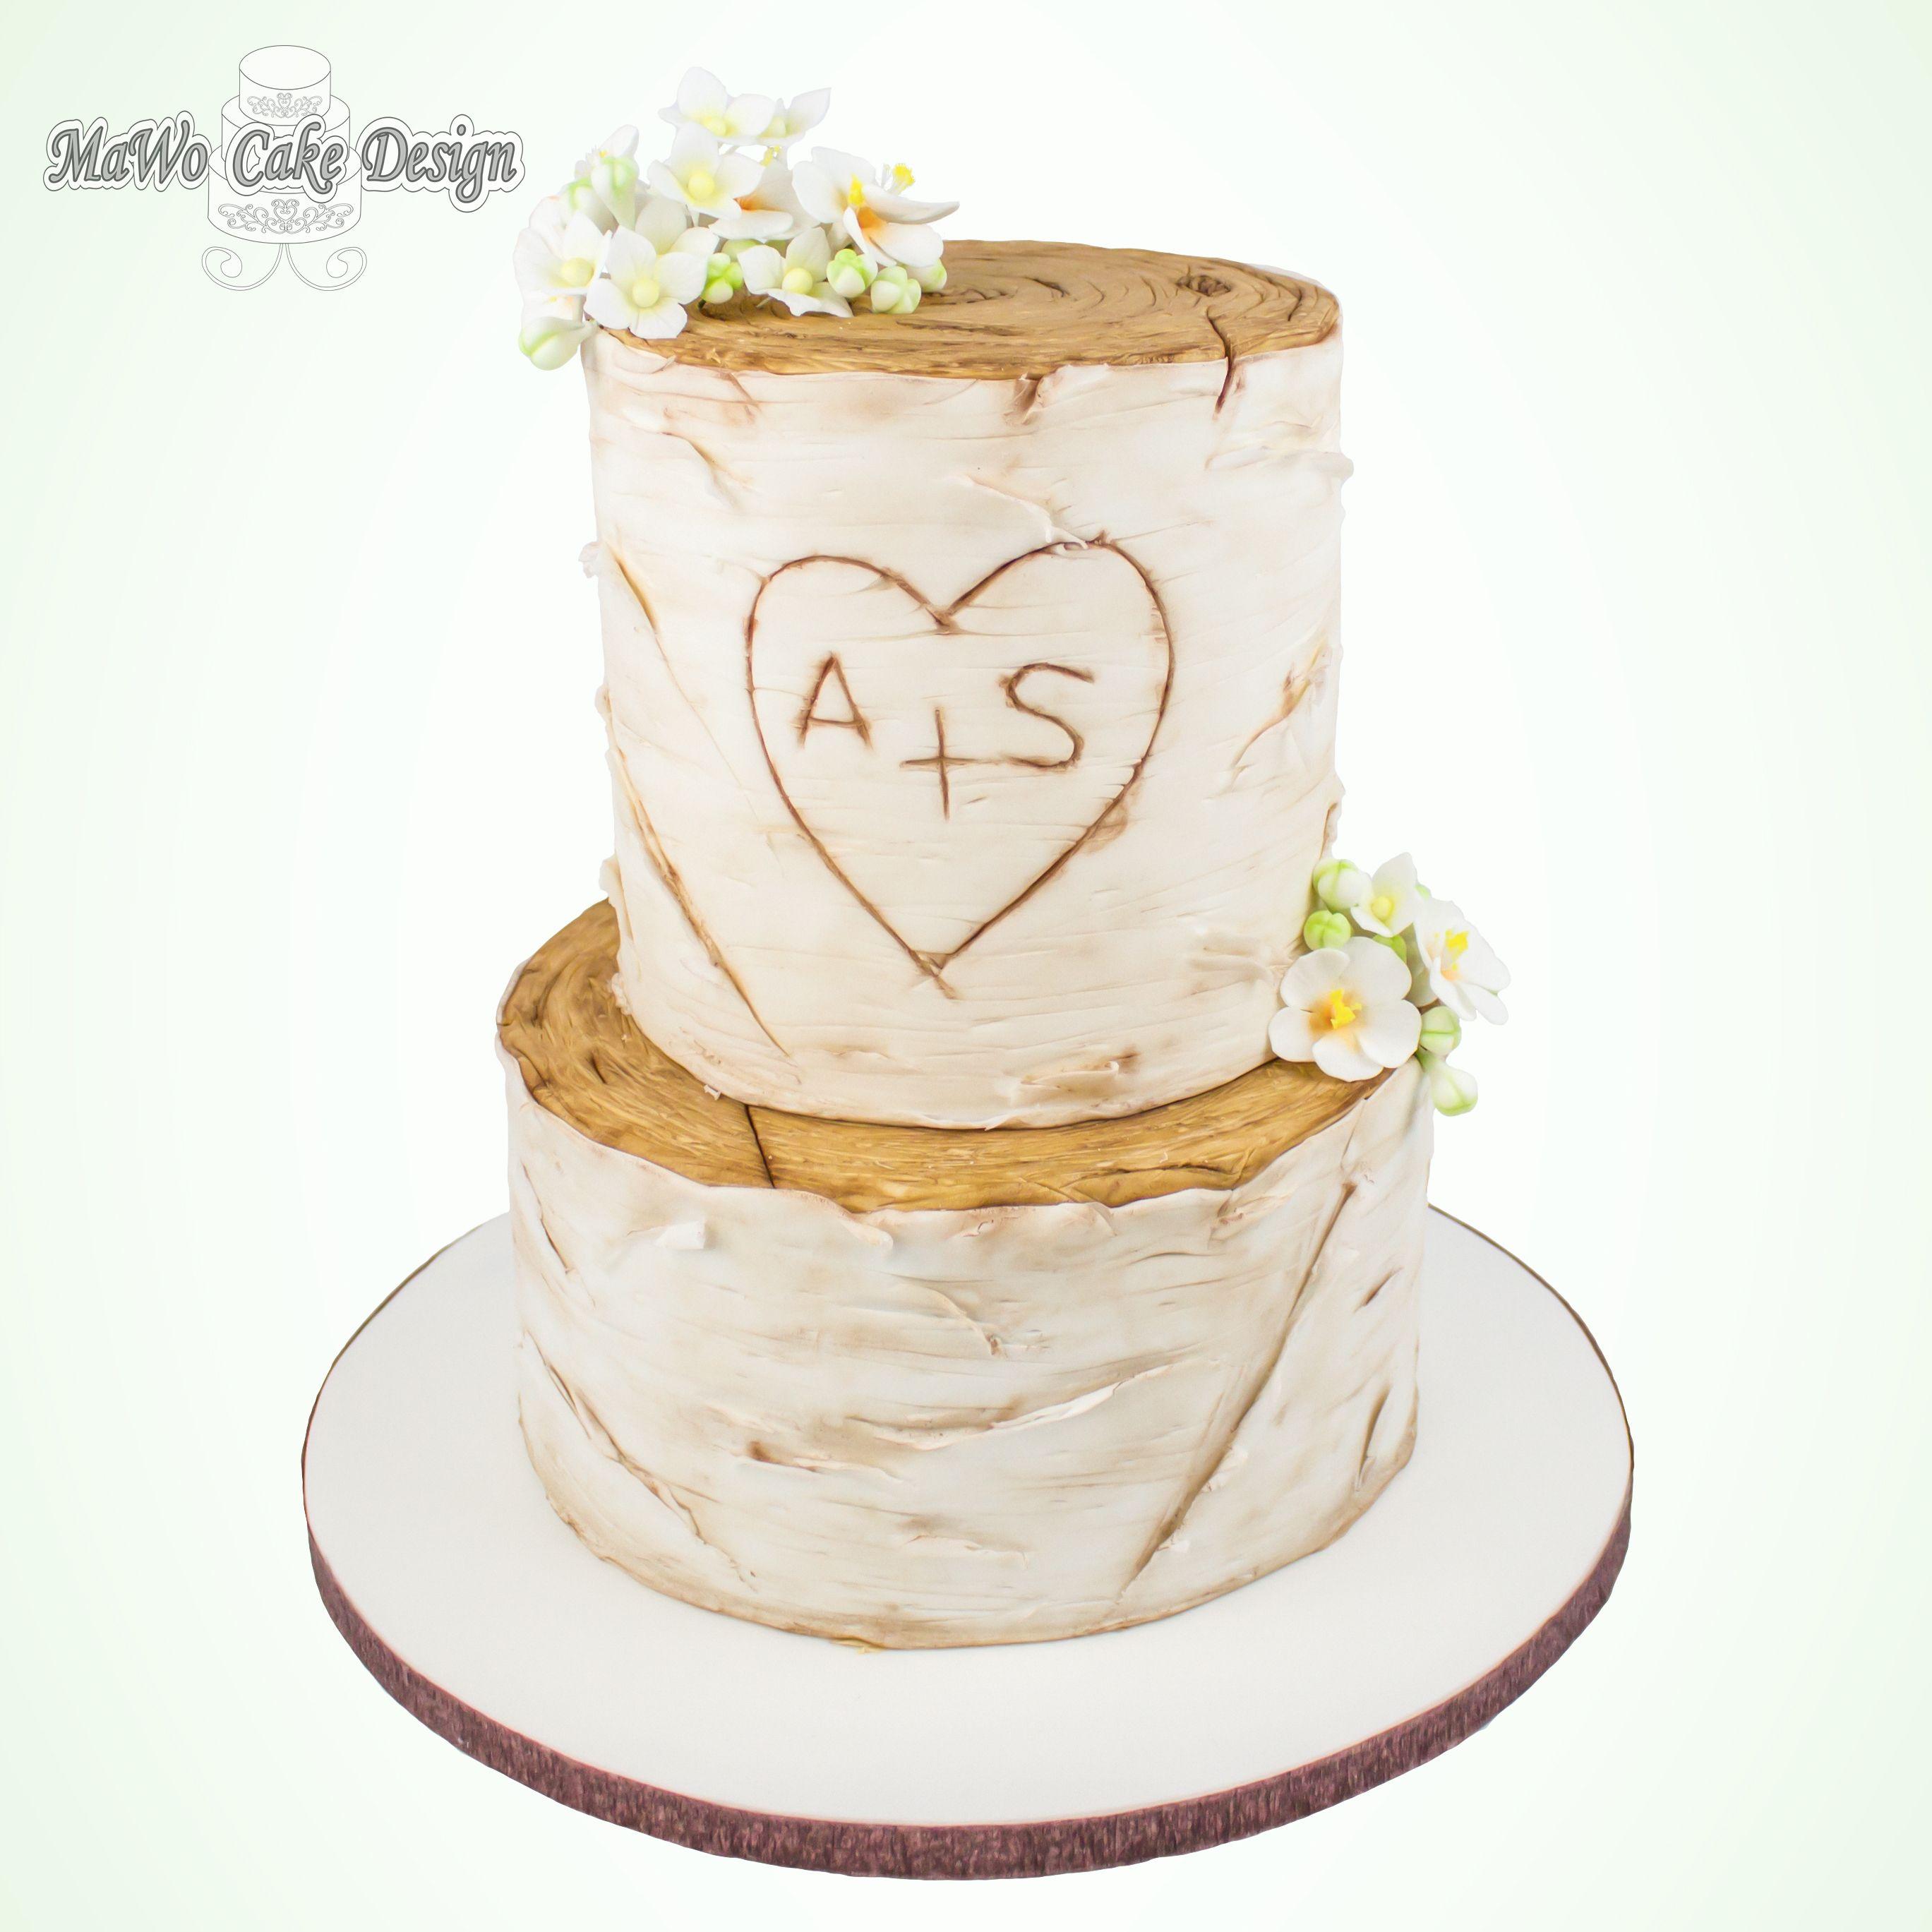 Hochzeitstorte in Birken-Optik bei MaWo Cake Design